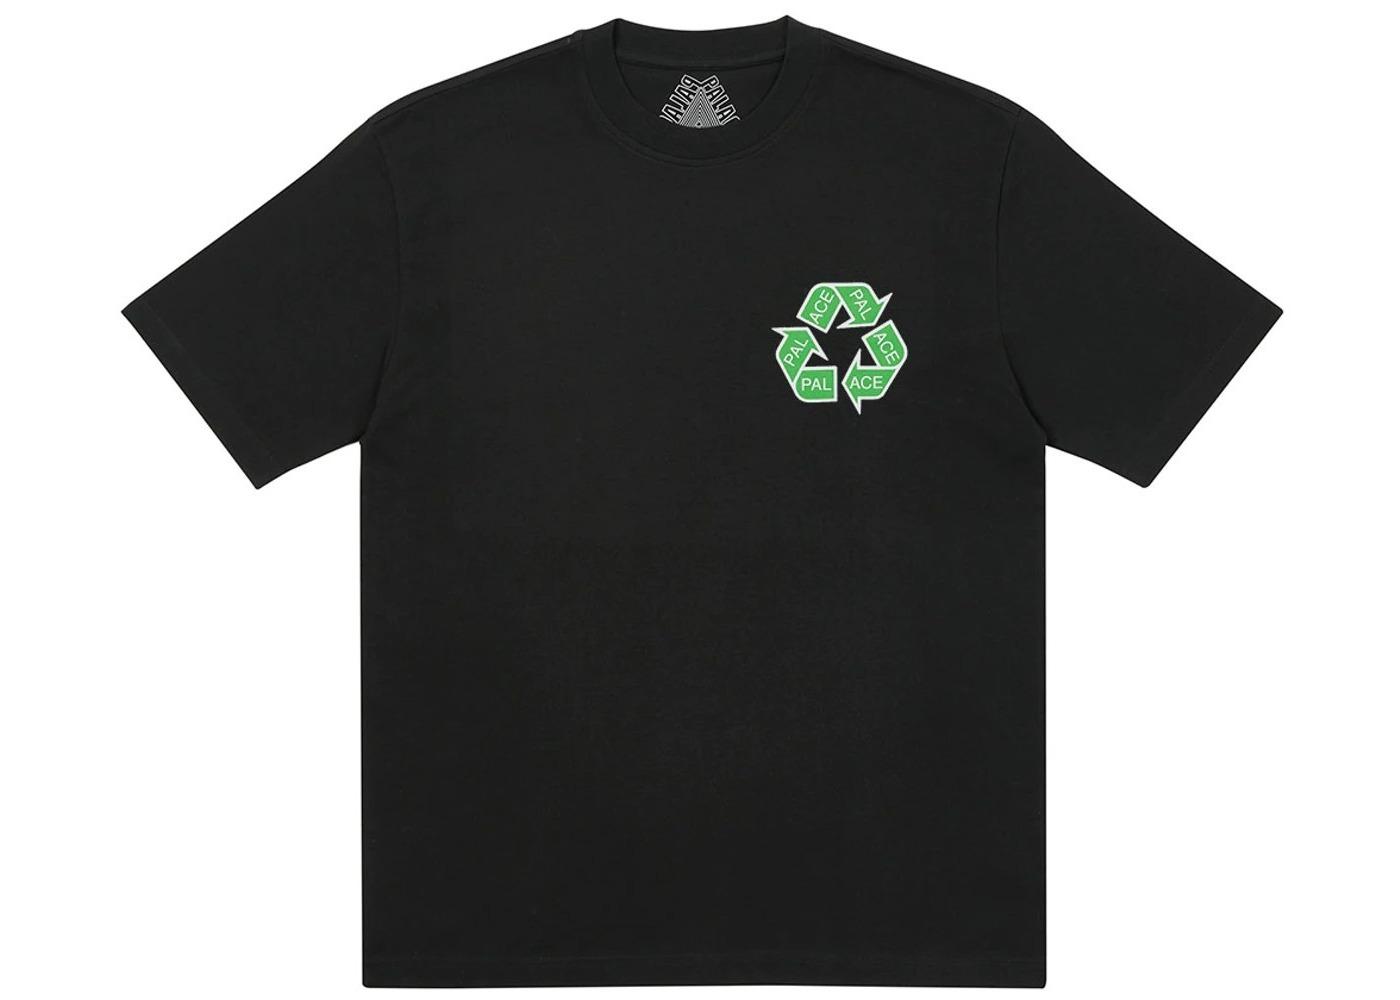 Palace P Cycle T-Shirt Black (SS21)の写真